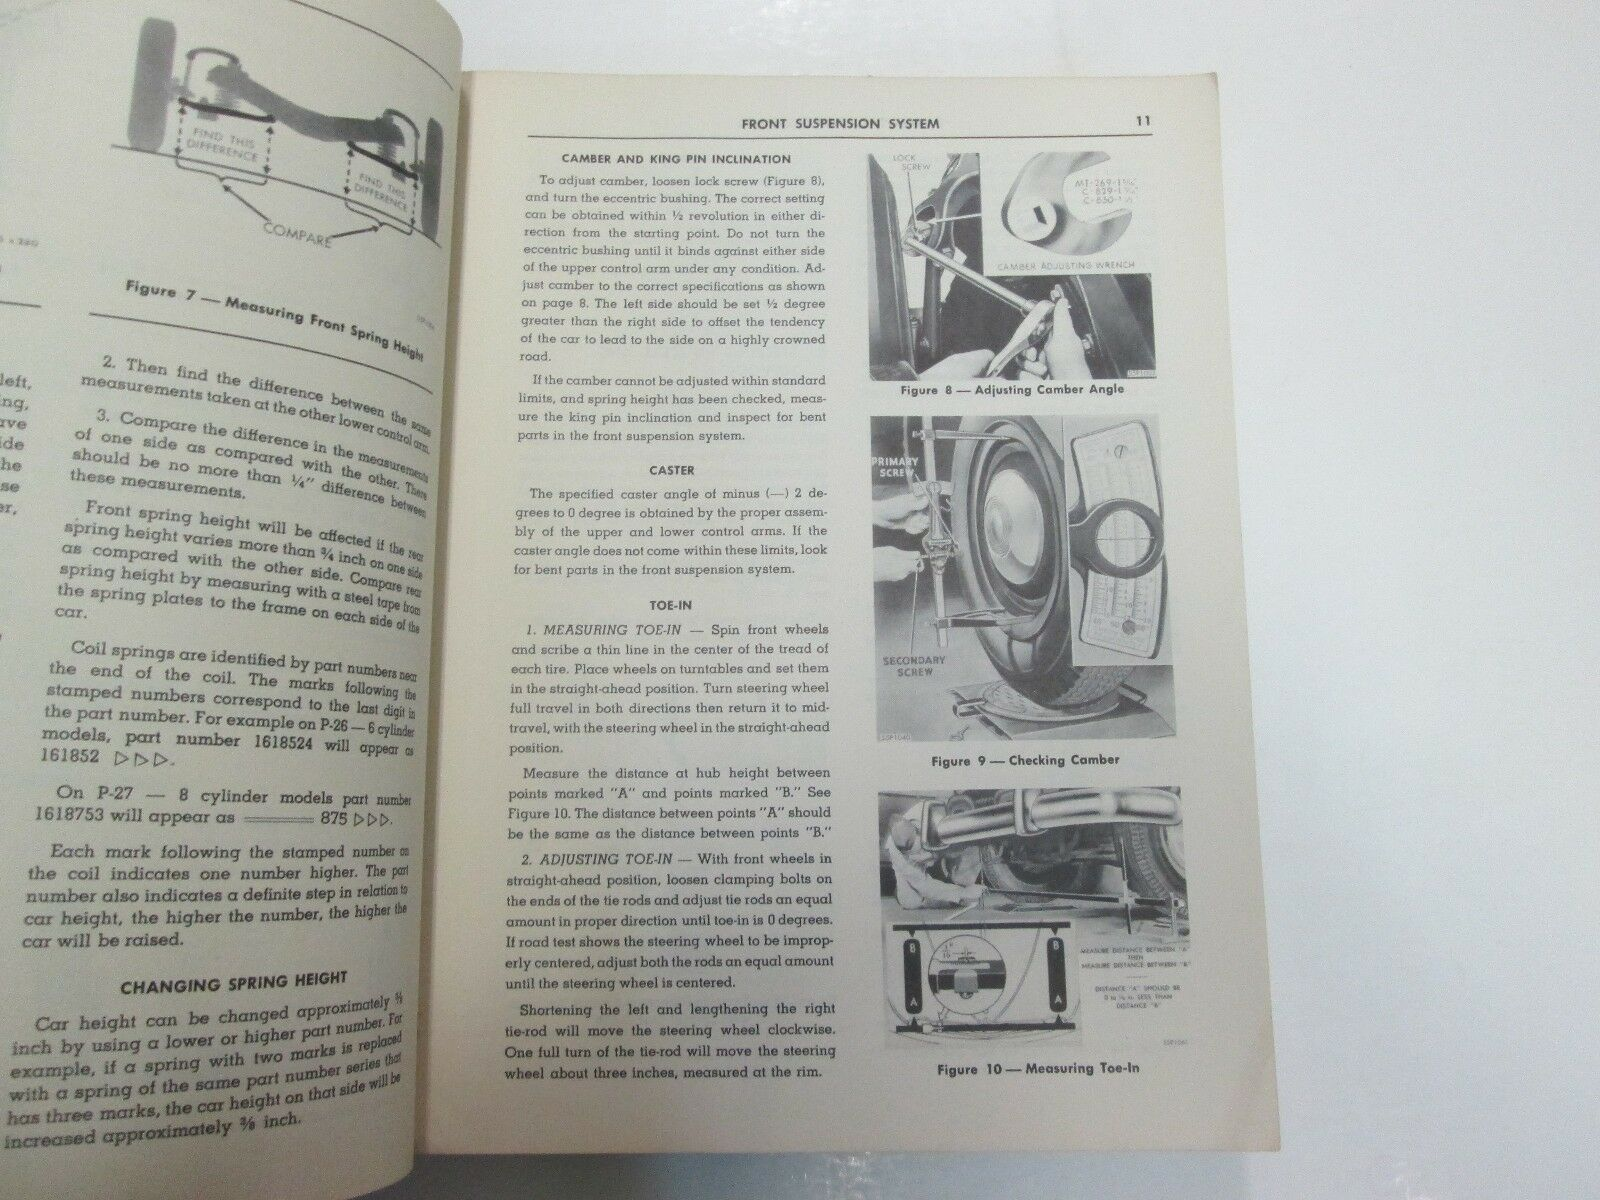 1955 Plymouth Plaza Savoy Belvedere PowerFlow 6 Hy-Fire V8 Service Shop Manual